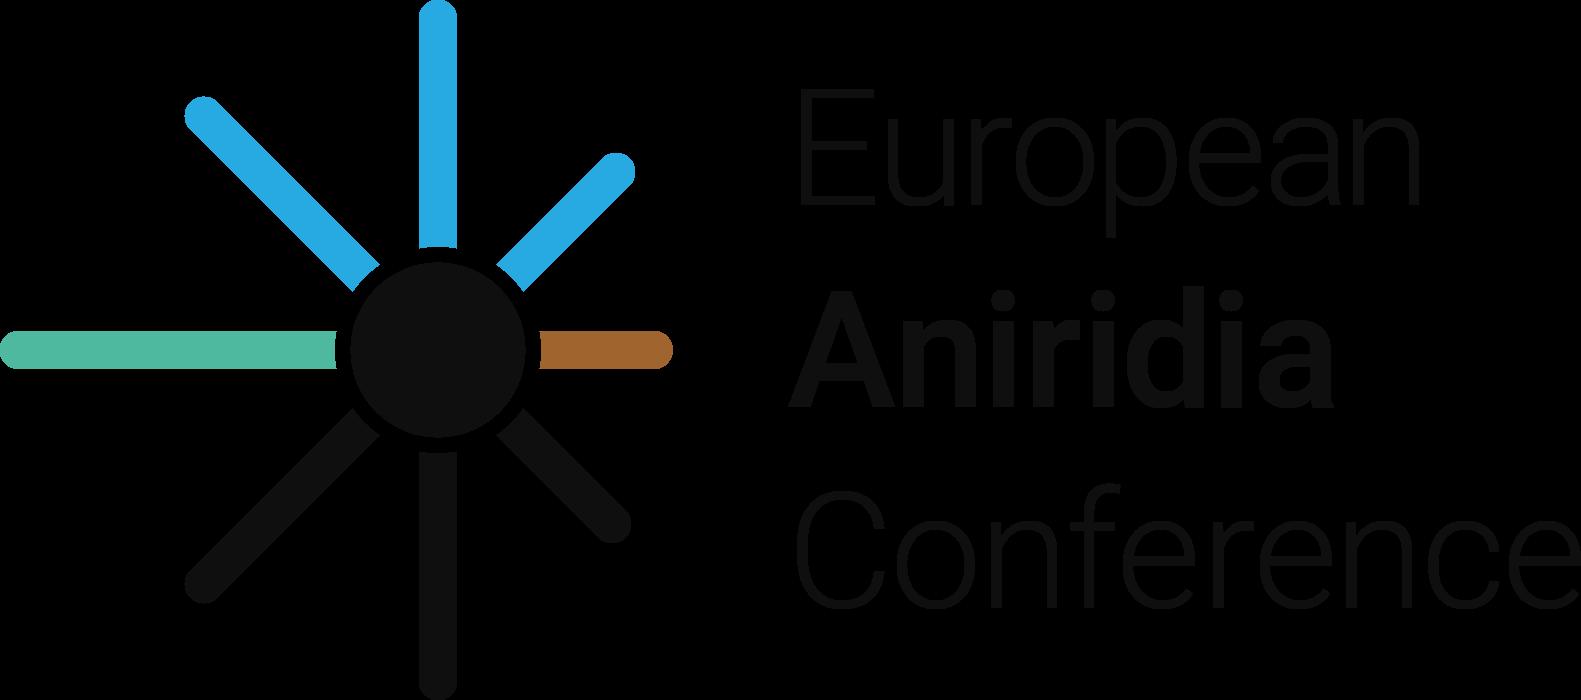 European Aniridia Conference logo